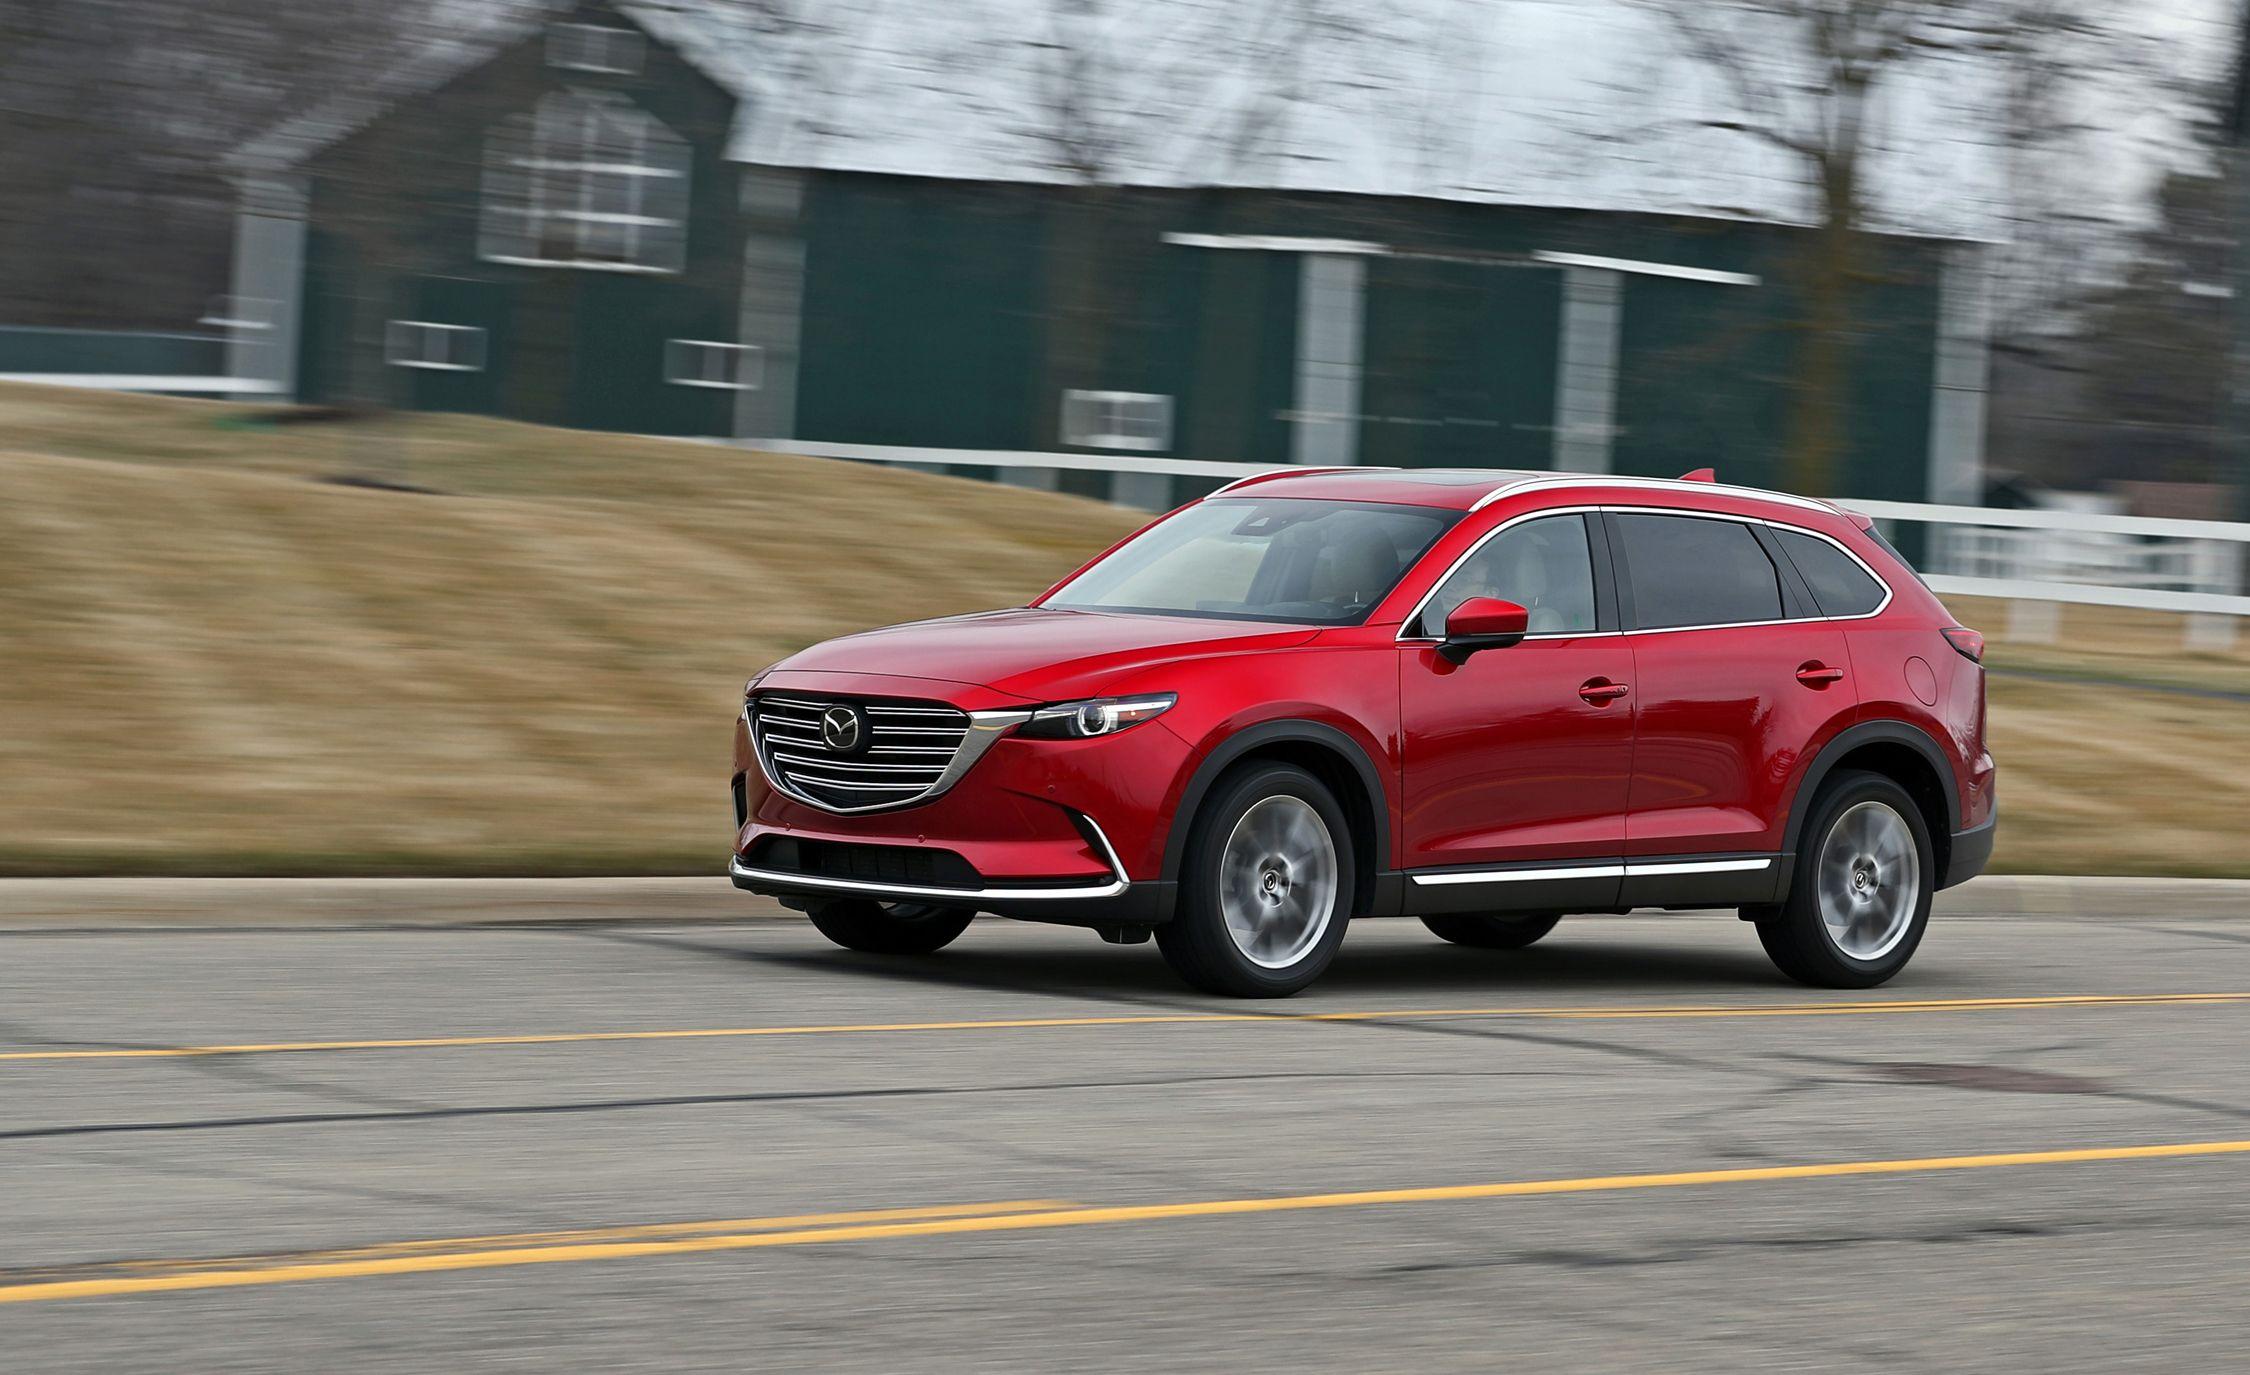 2019 Mazda Cx 9 Reviews Price Photos And Specs Car Driver